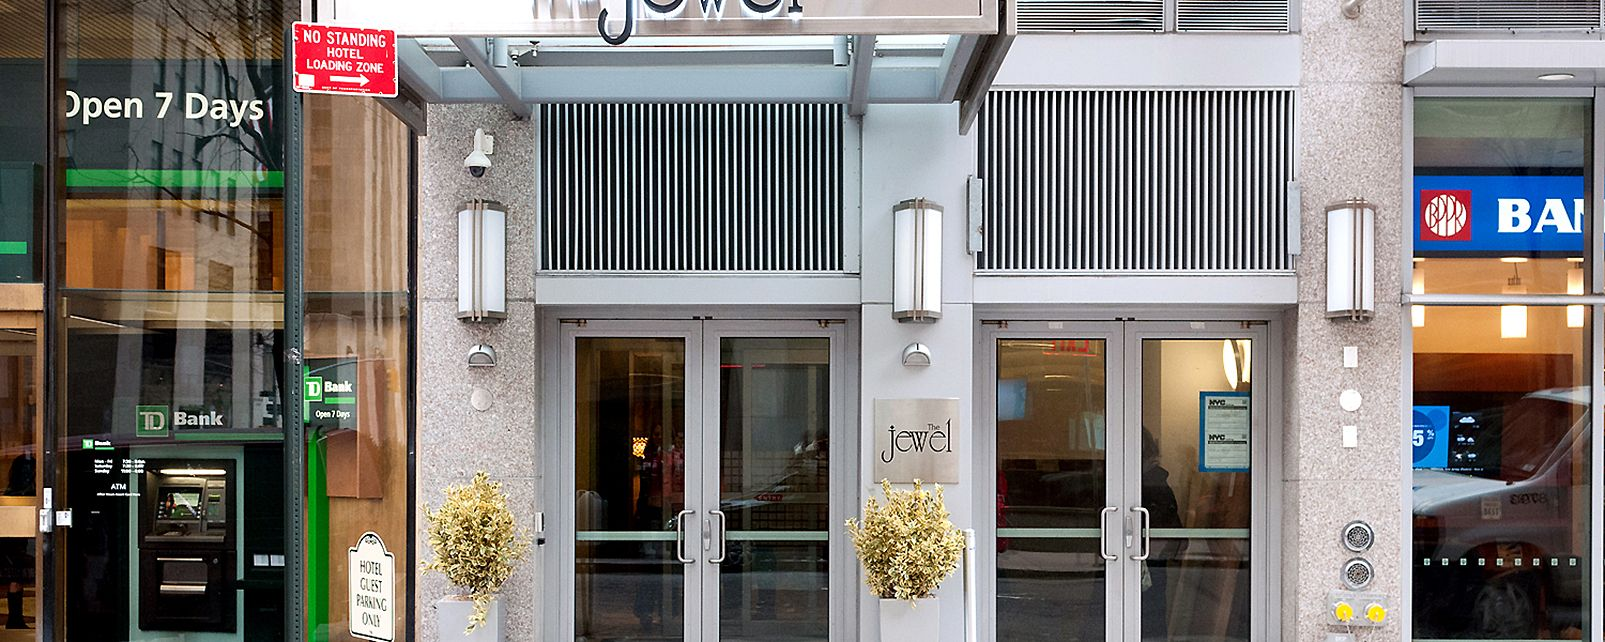 Hotel The Jewel